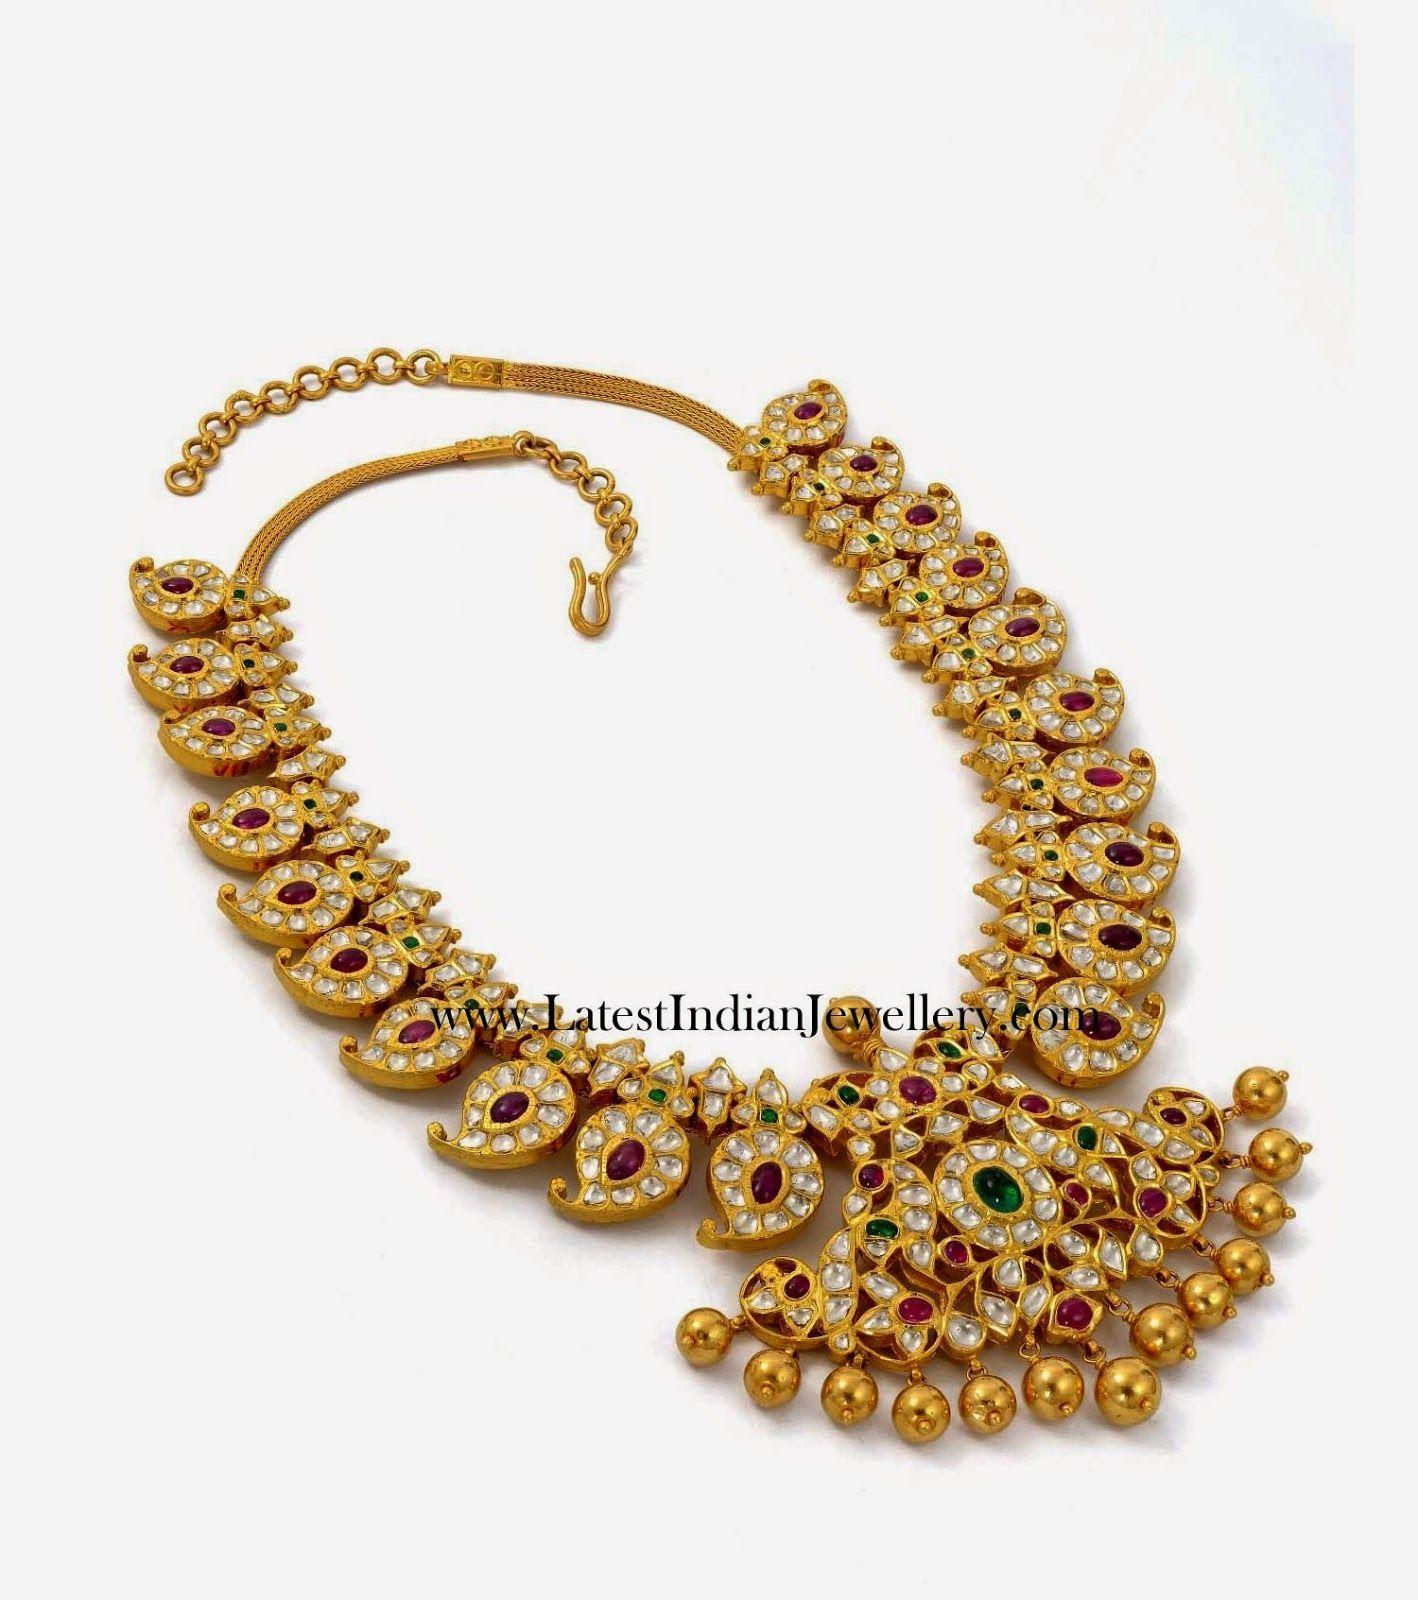 Diamond South Indian Jewellery: Pachi Work Mango Mala Necklace